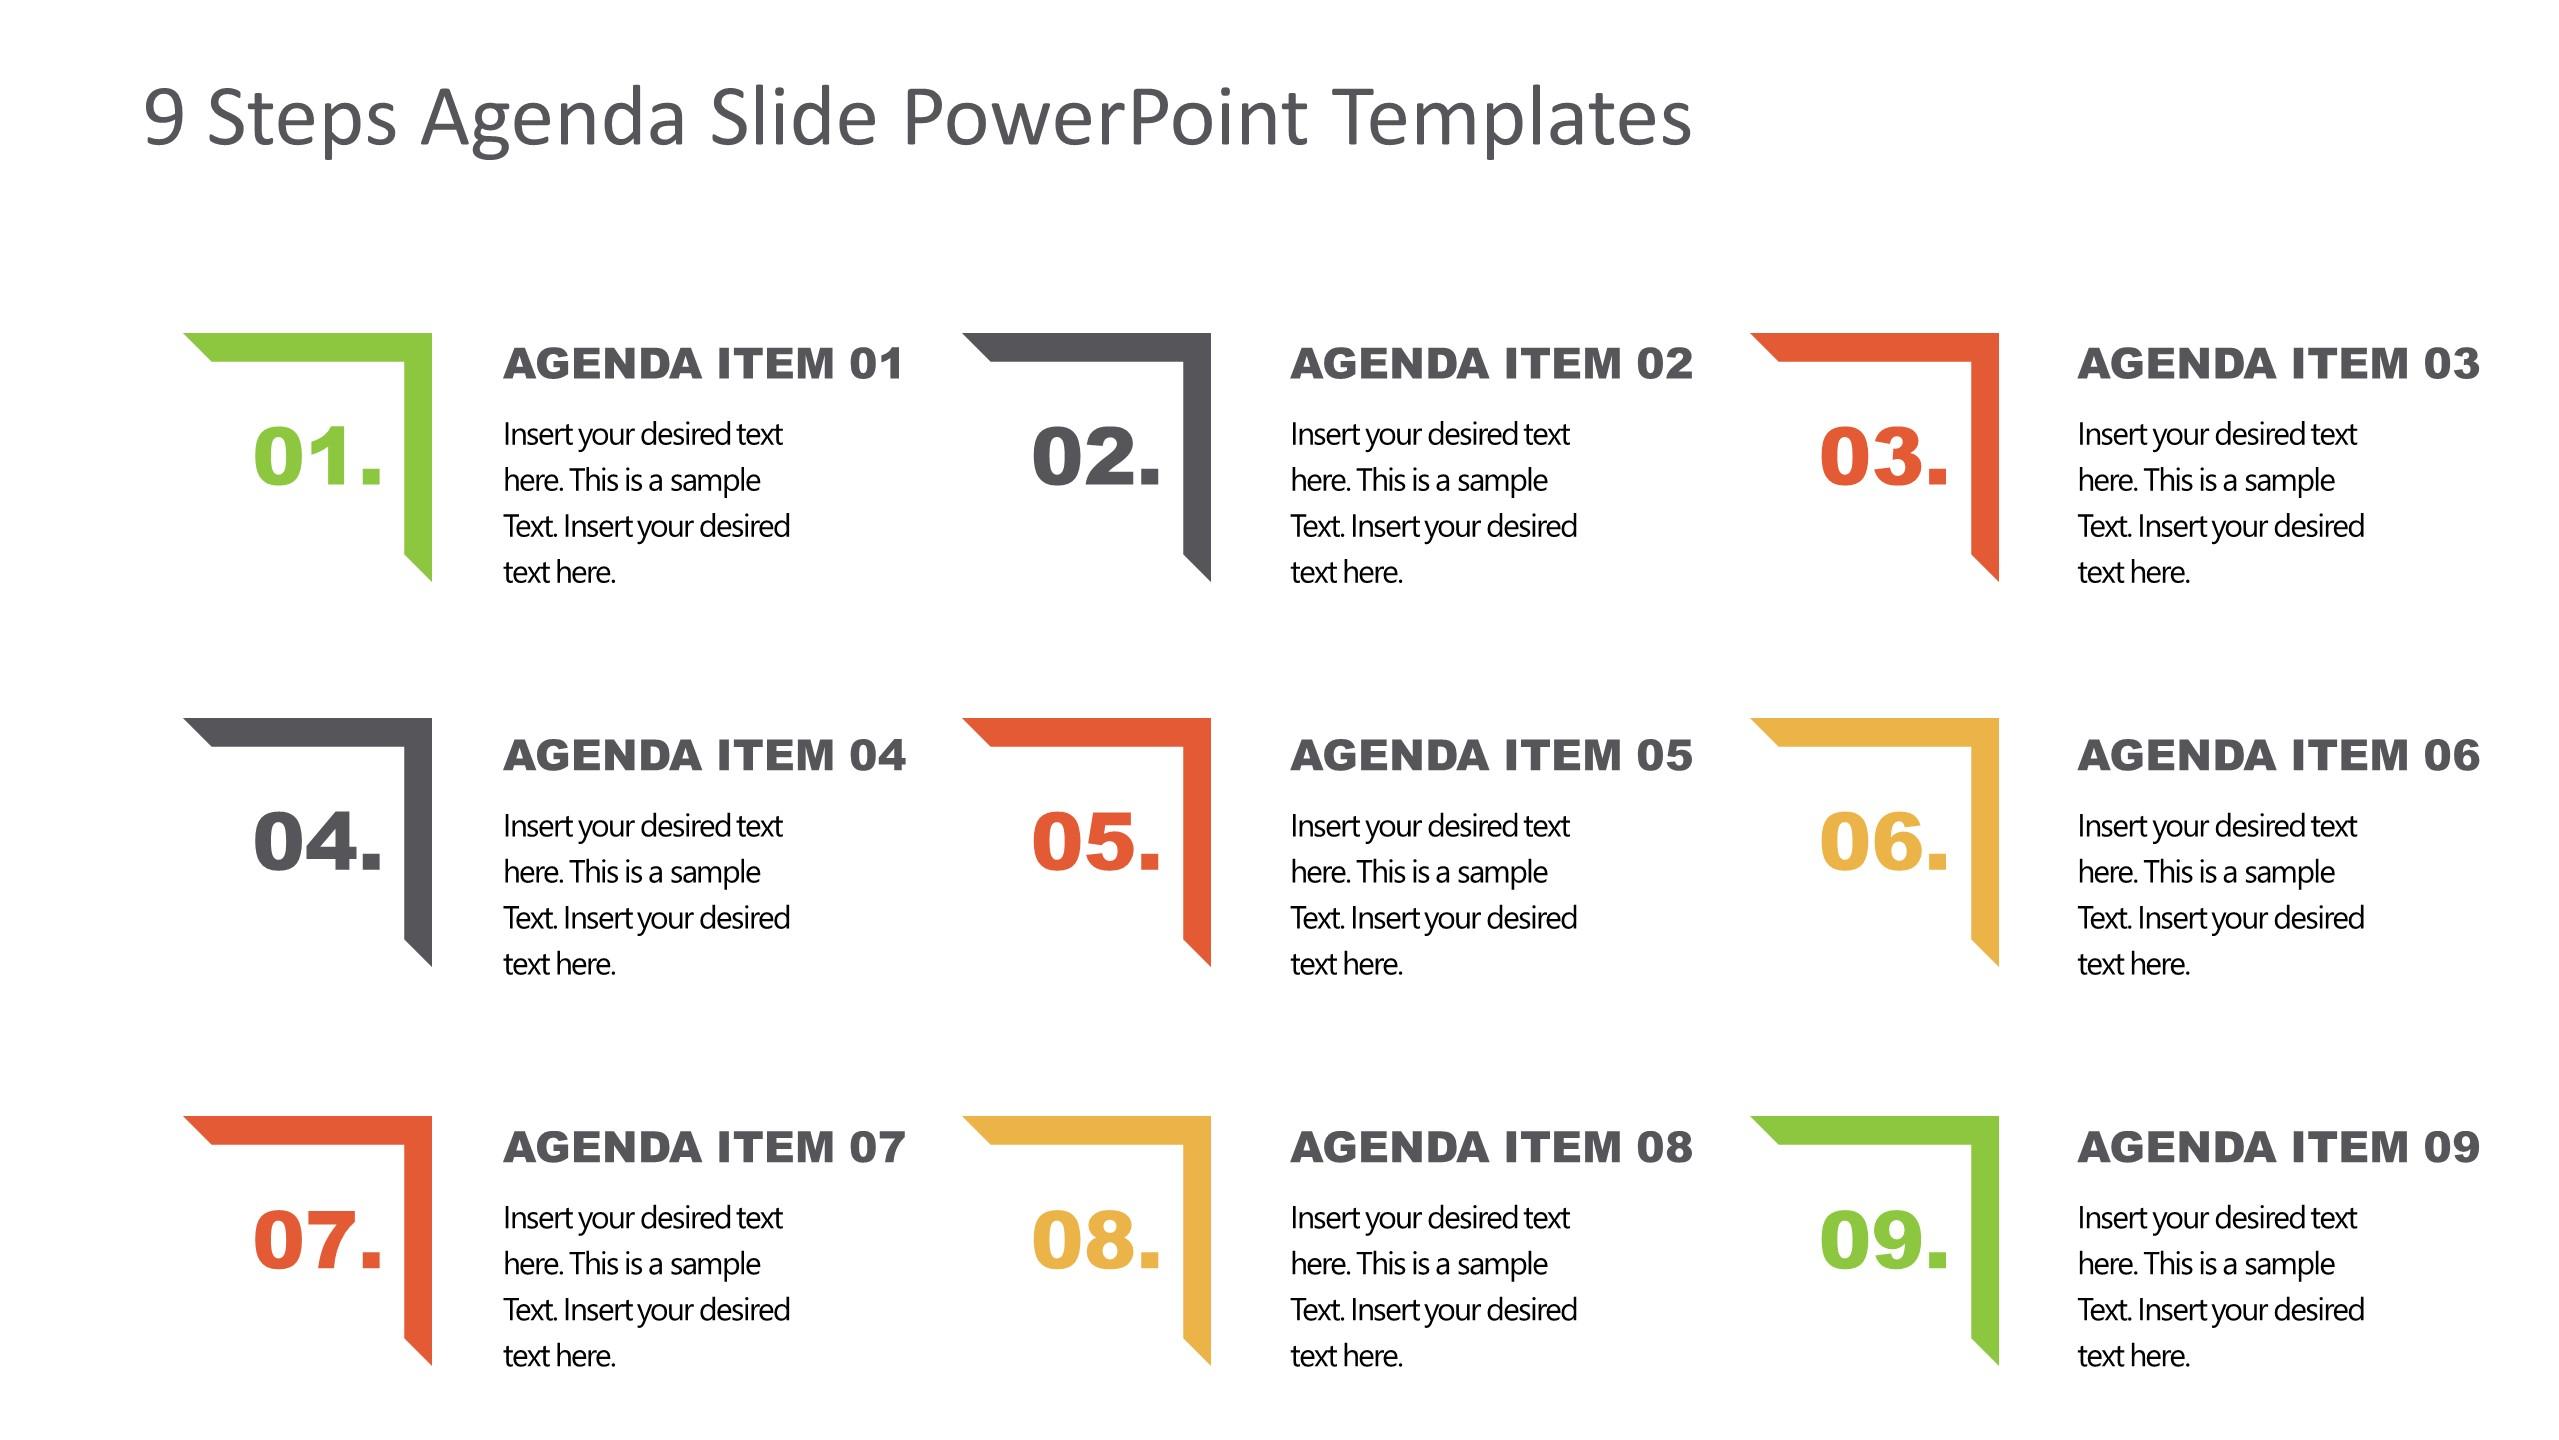 Agenda Presentation Template of 9 Items